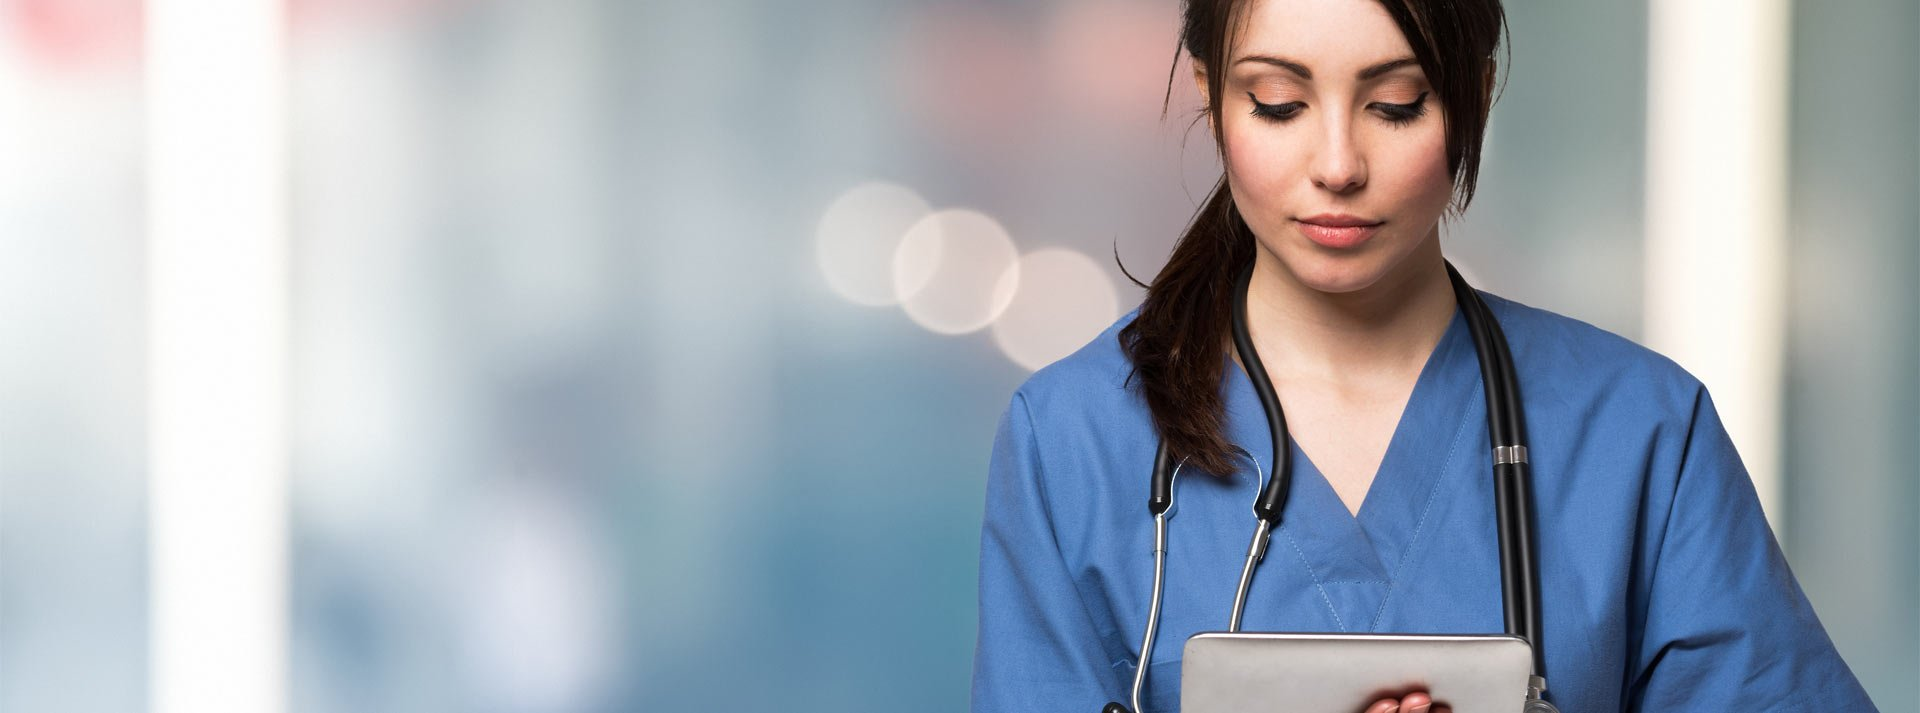 rn programs - registered nurse || registerednursing